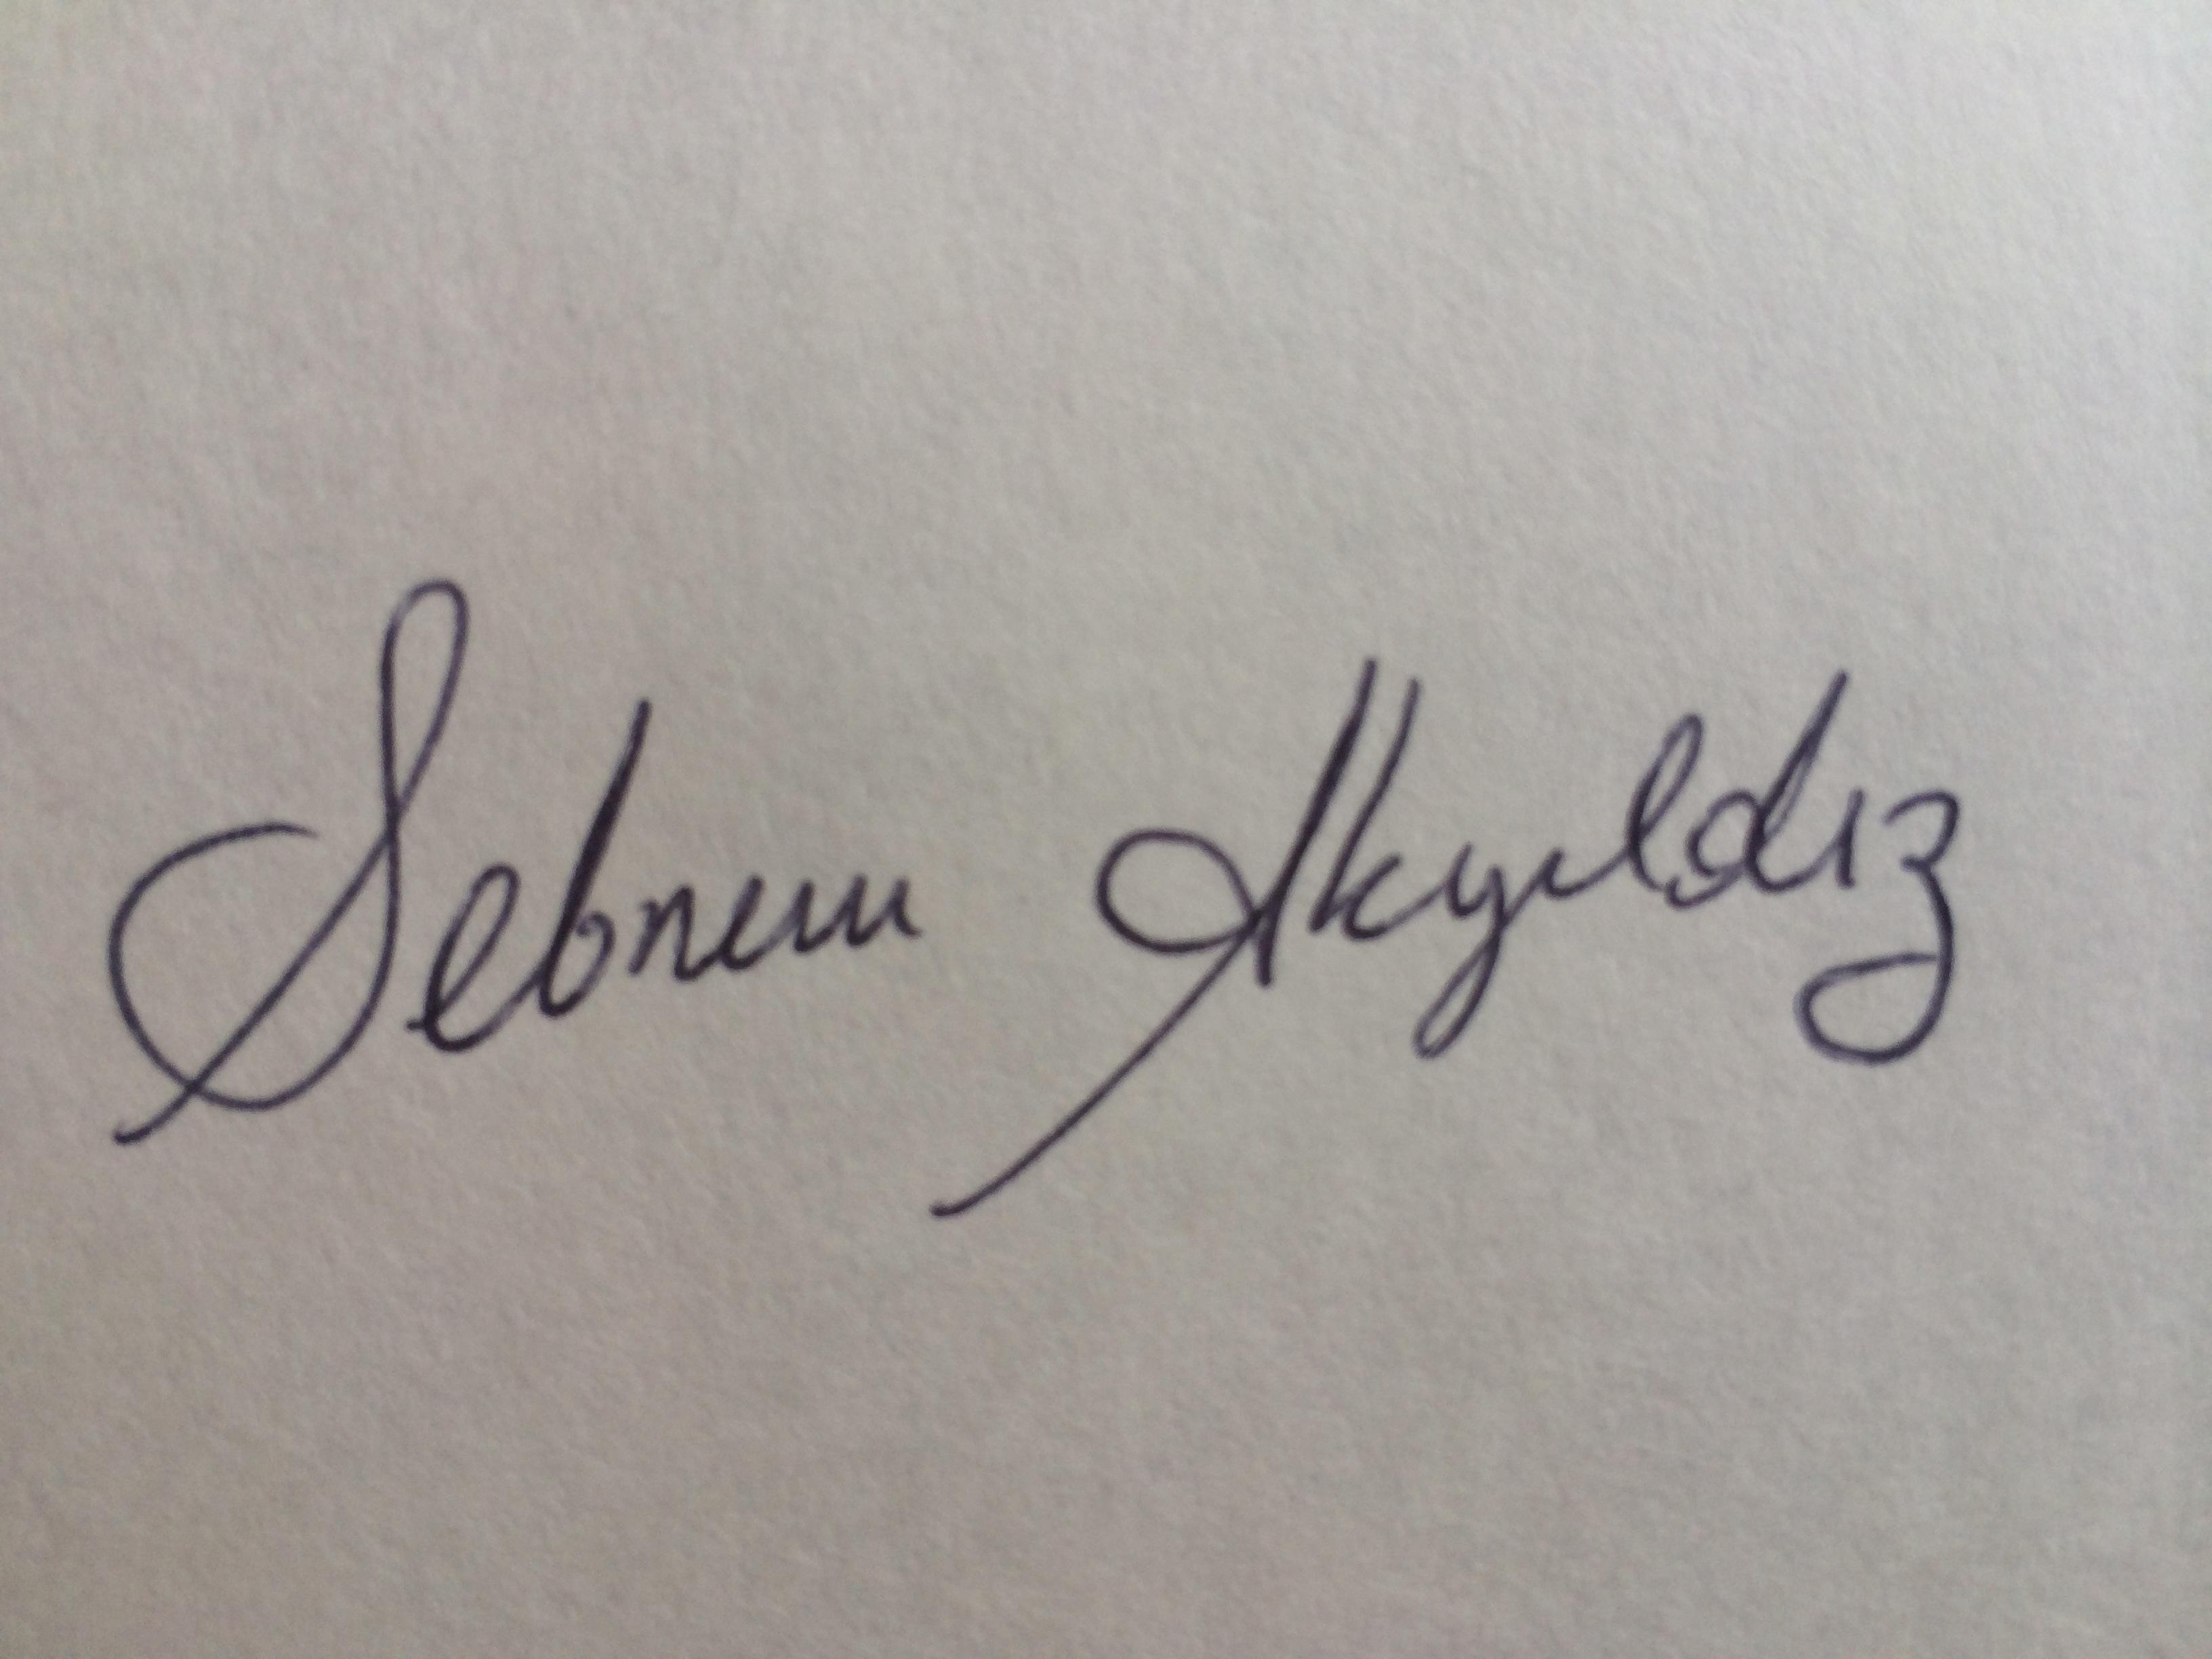 Sebnem AKYILDIZ Signature